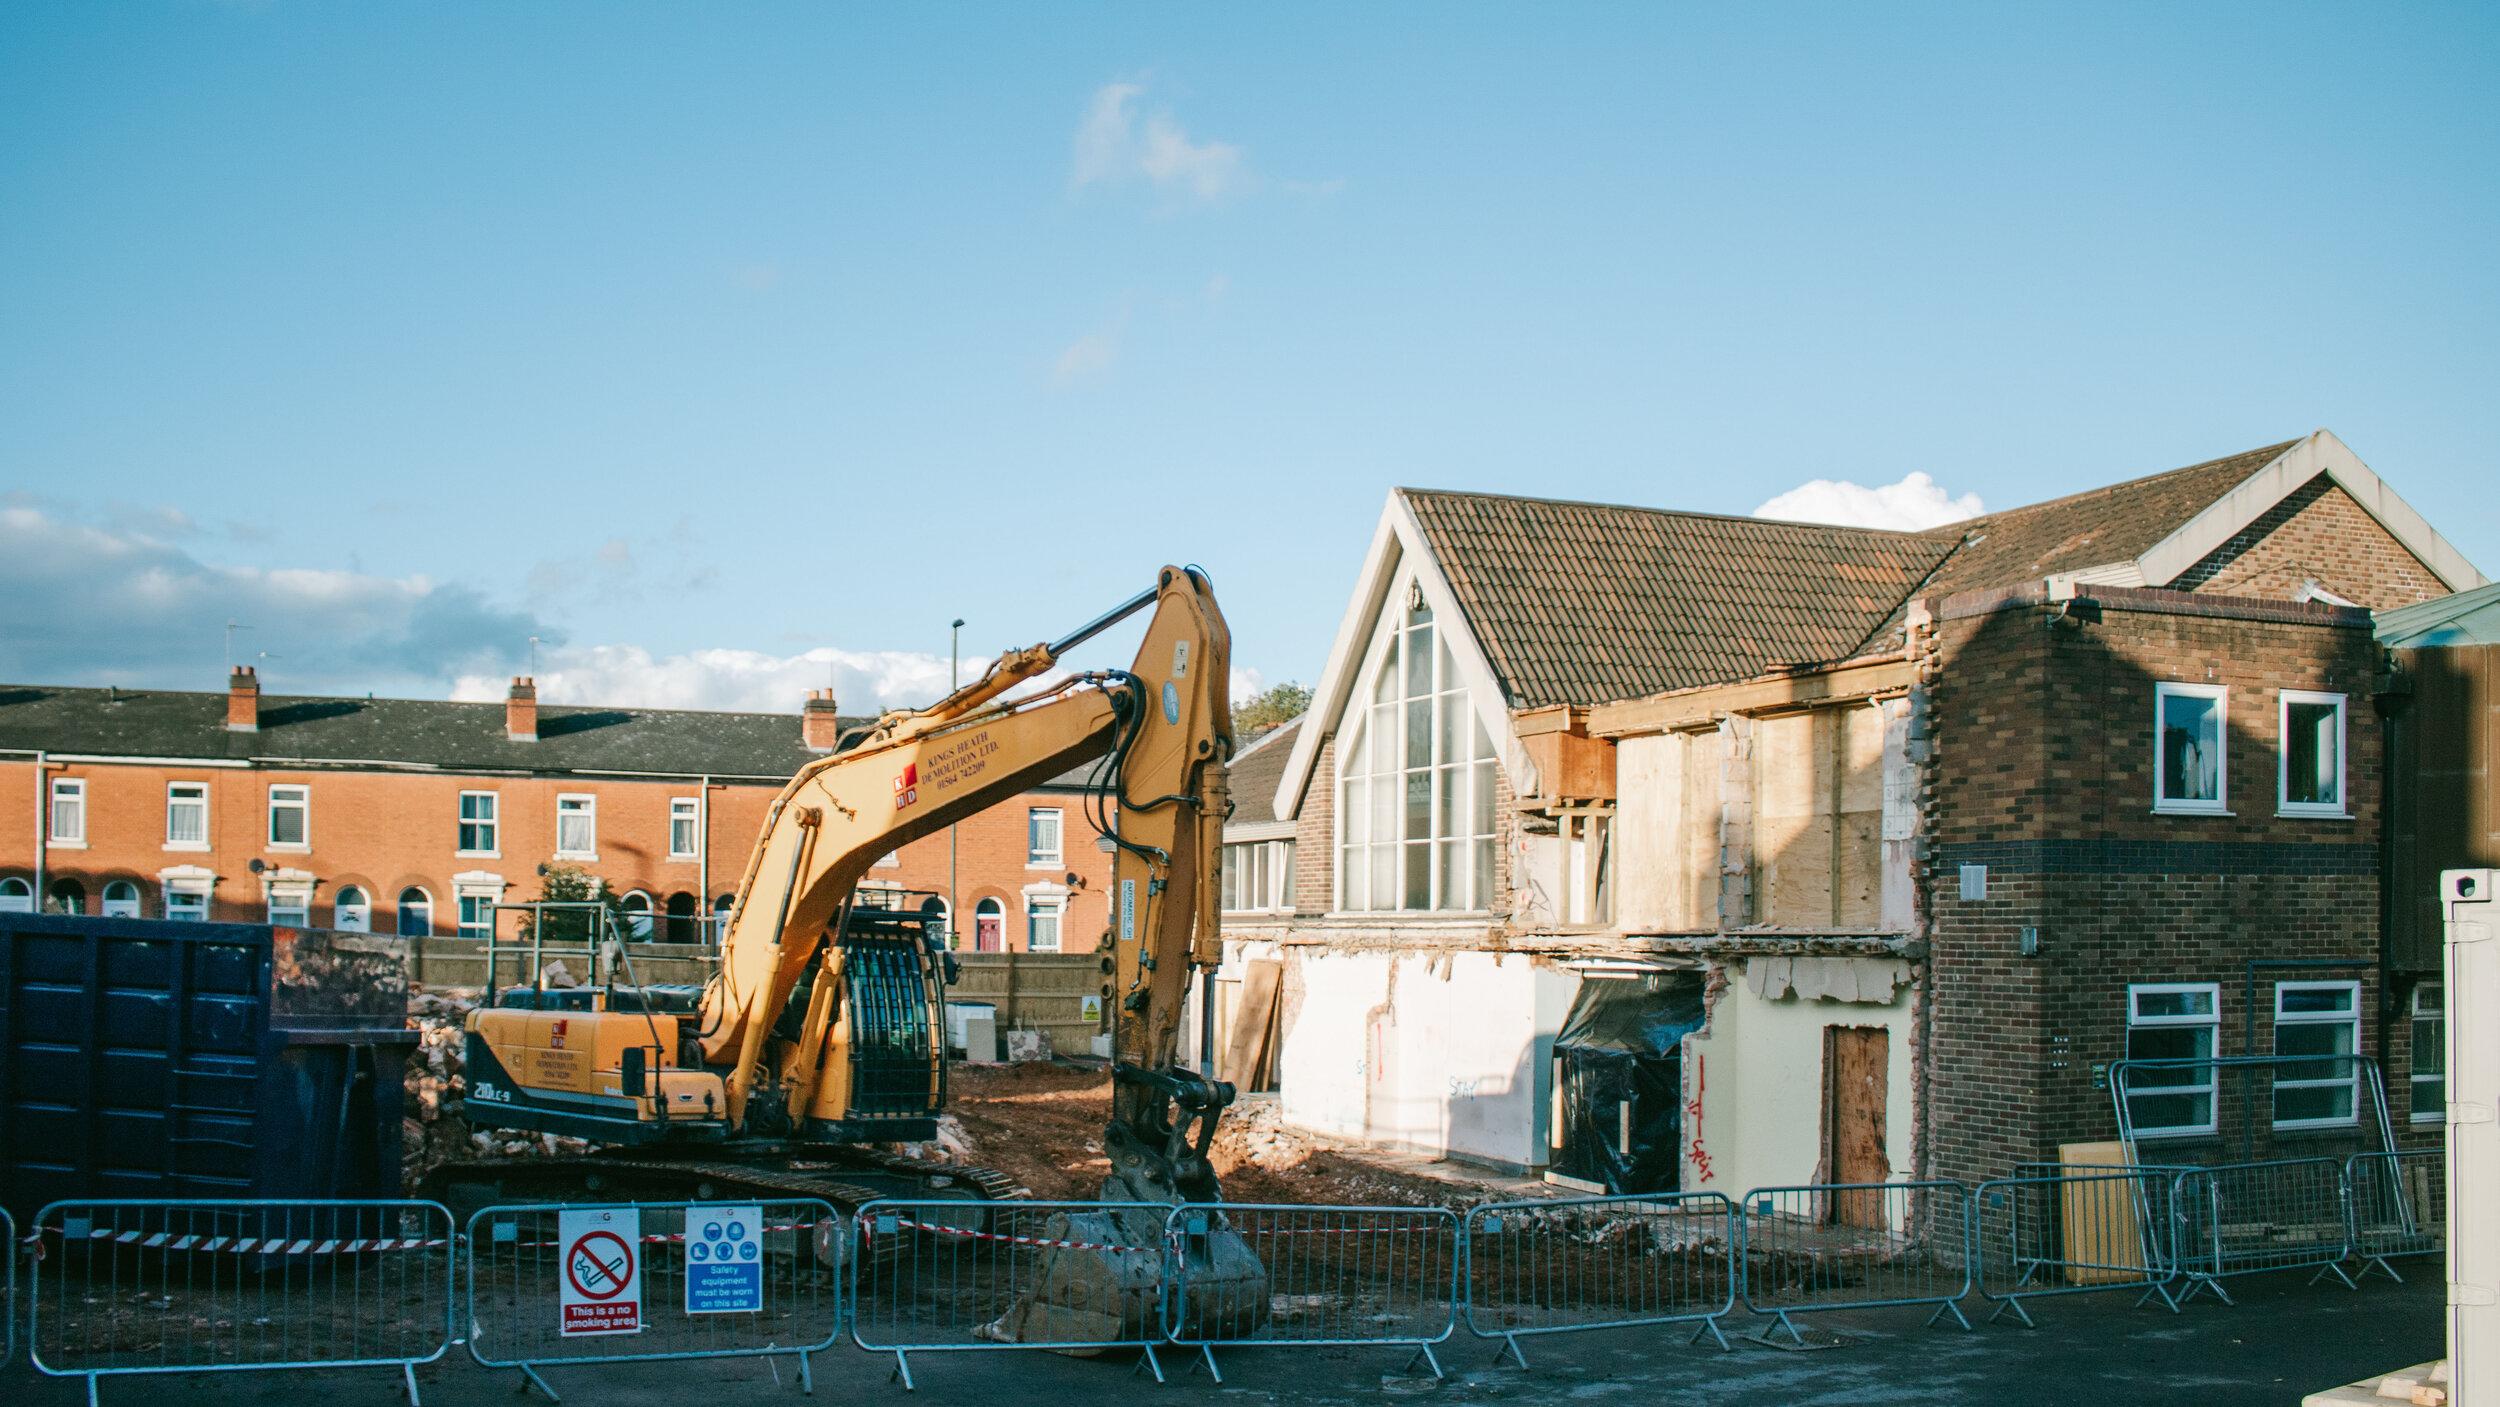 st-johns-harborne-bfm-demolition-oct-19-eo-3086-low.jpg